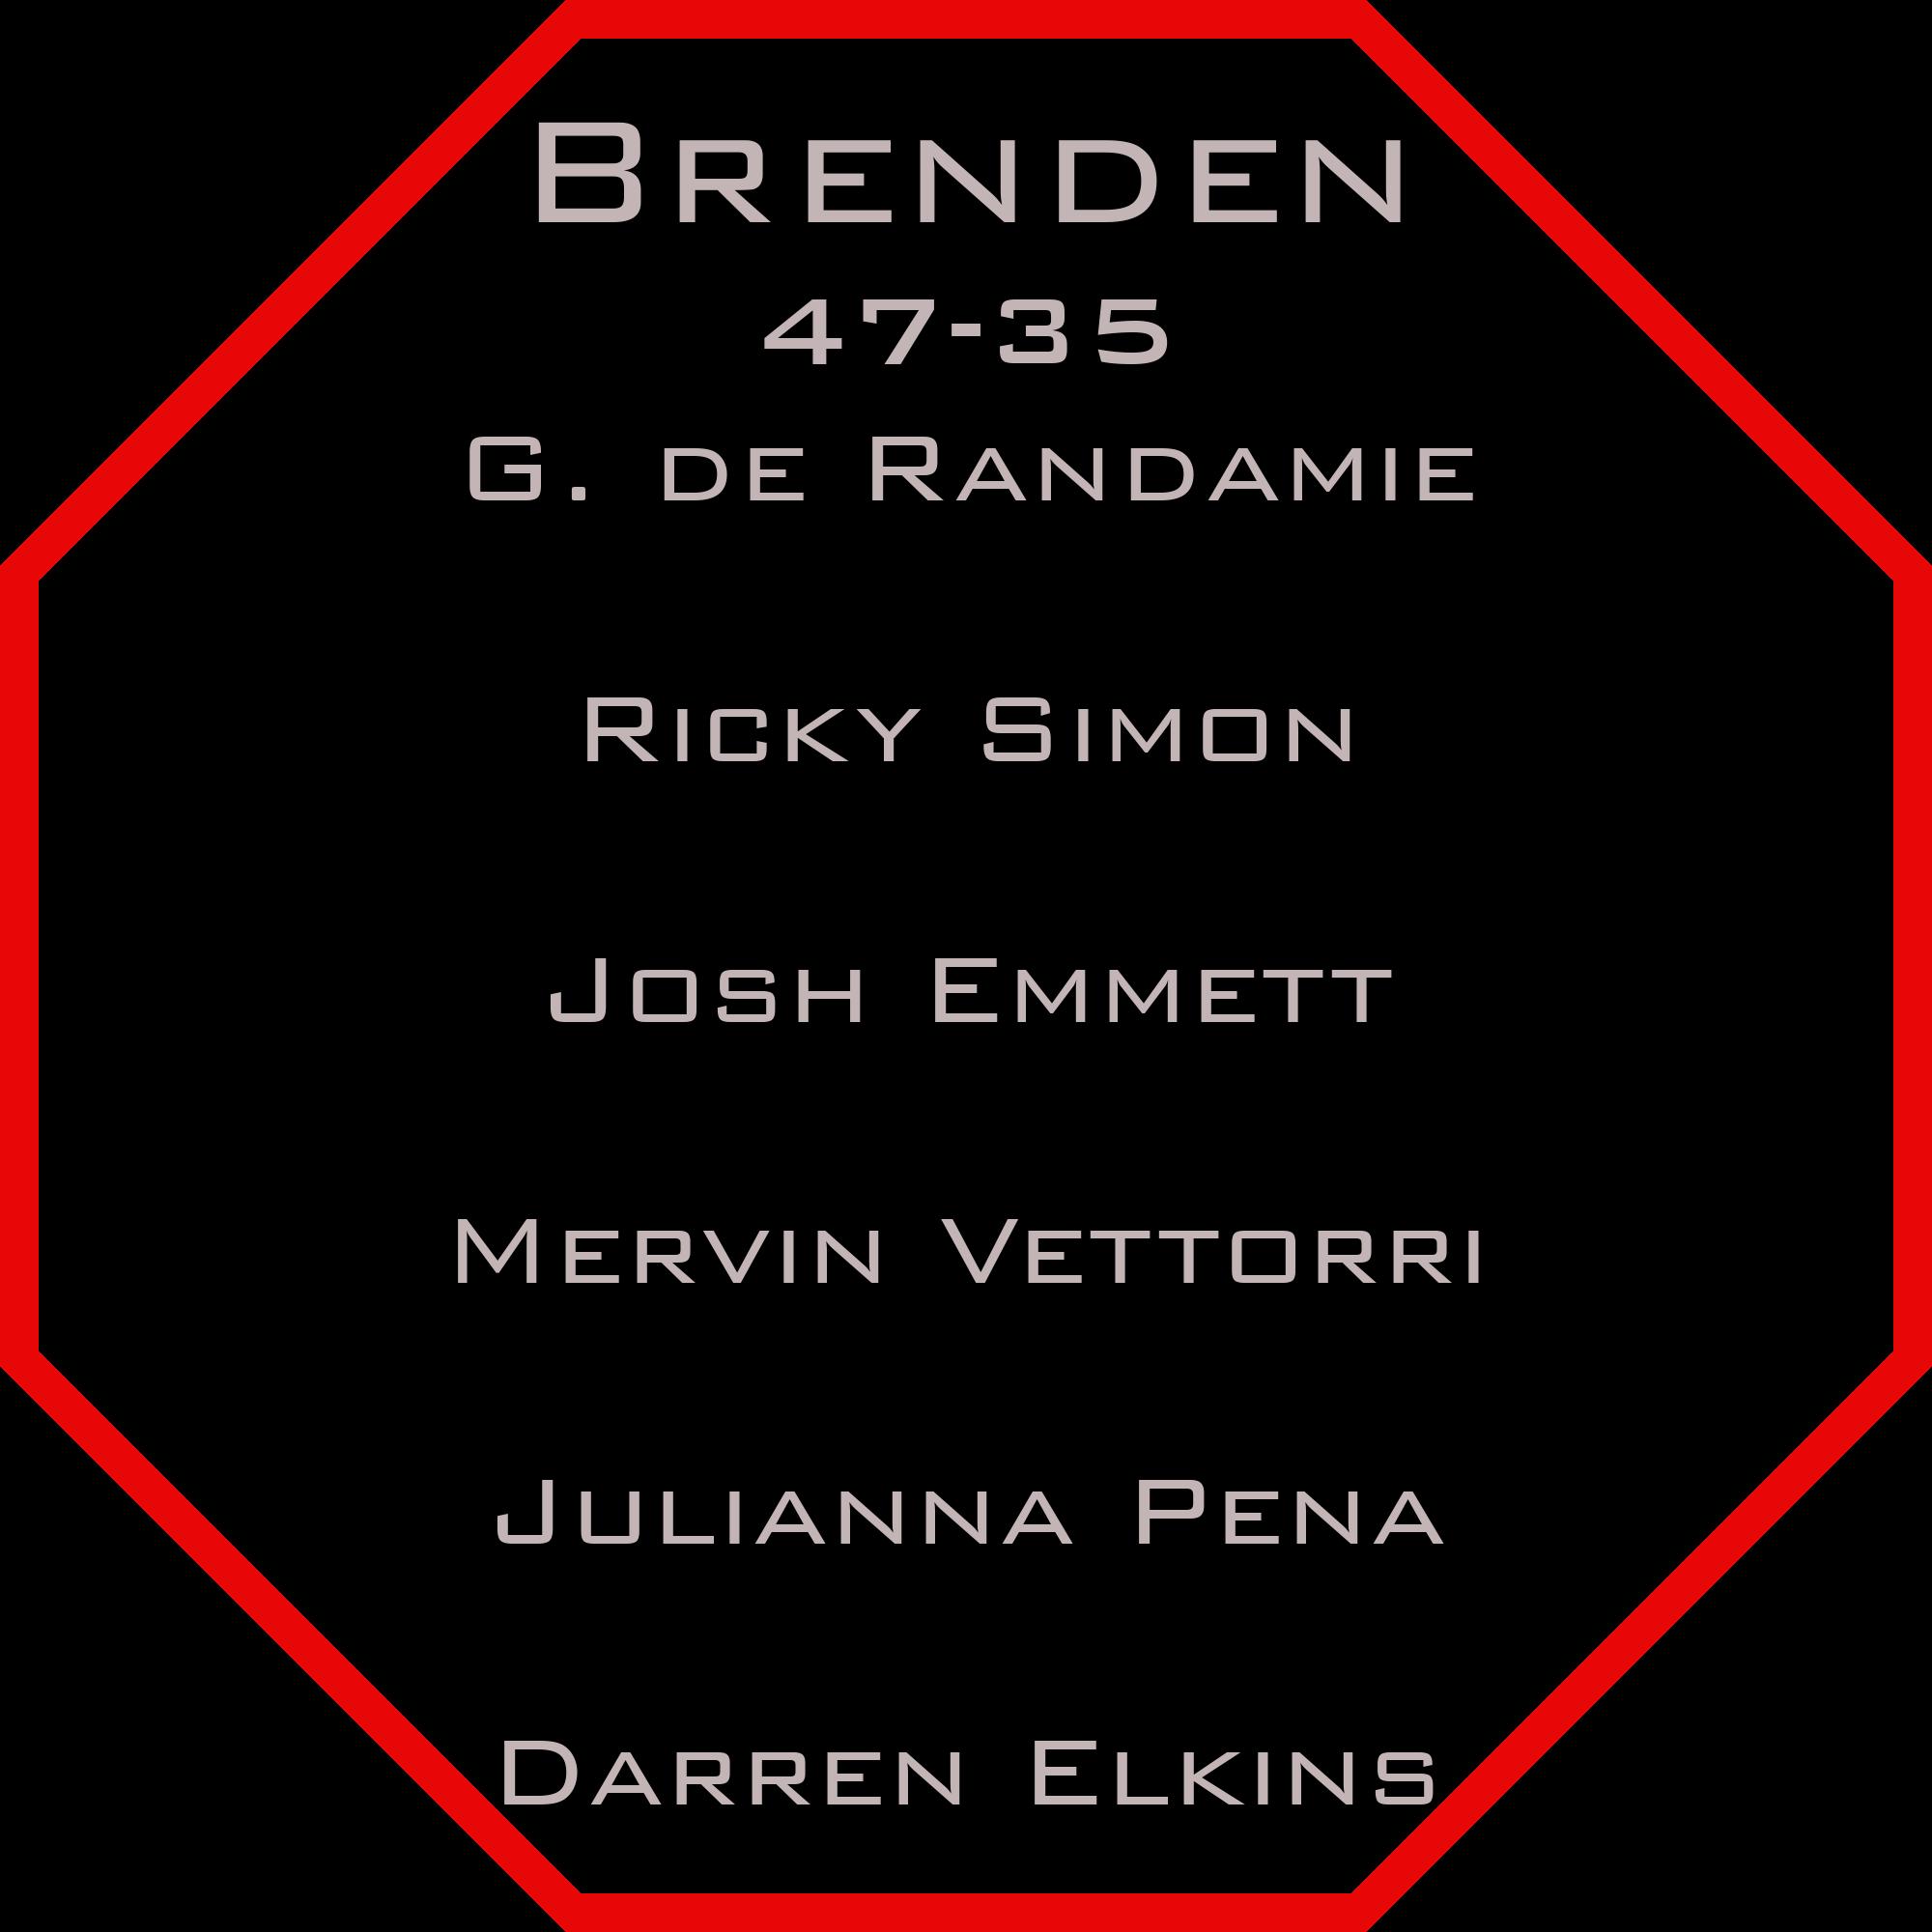 Sac Brenden.png